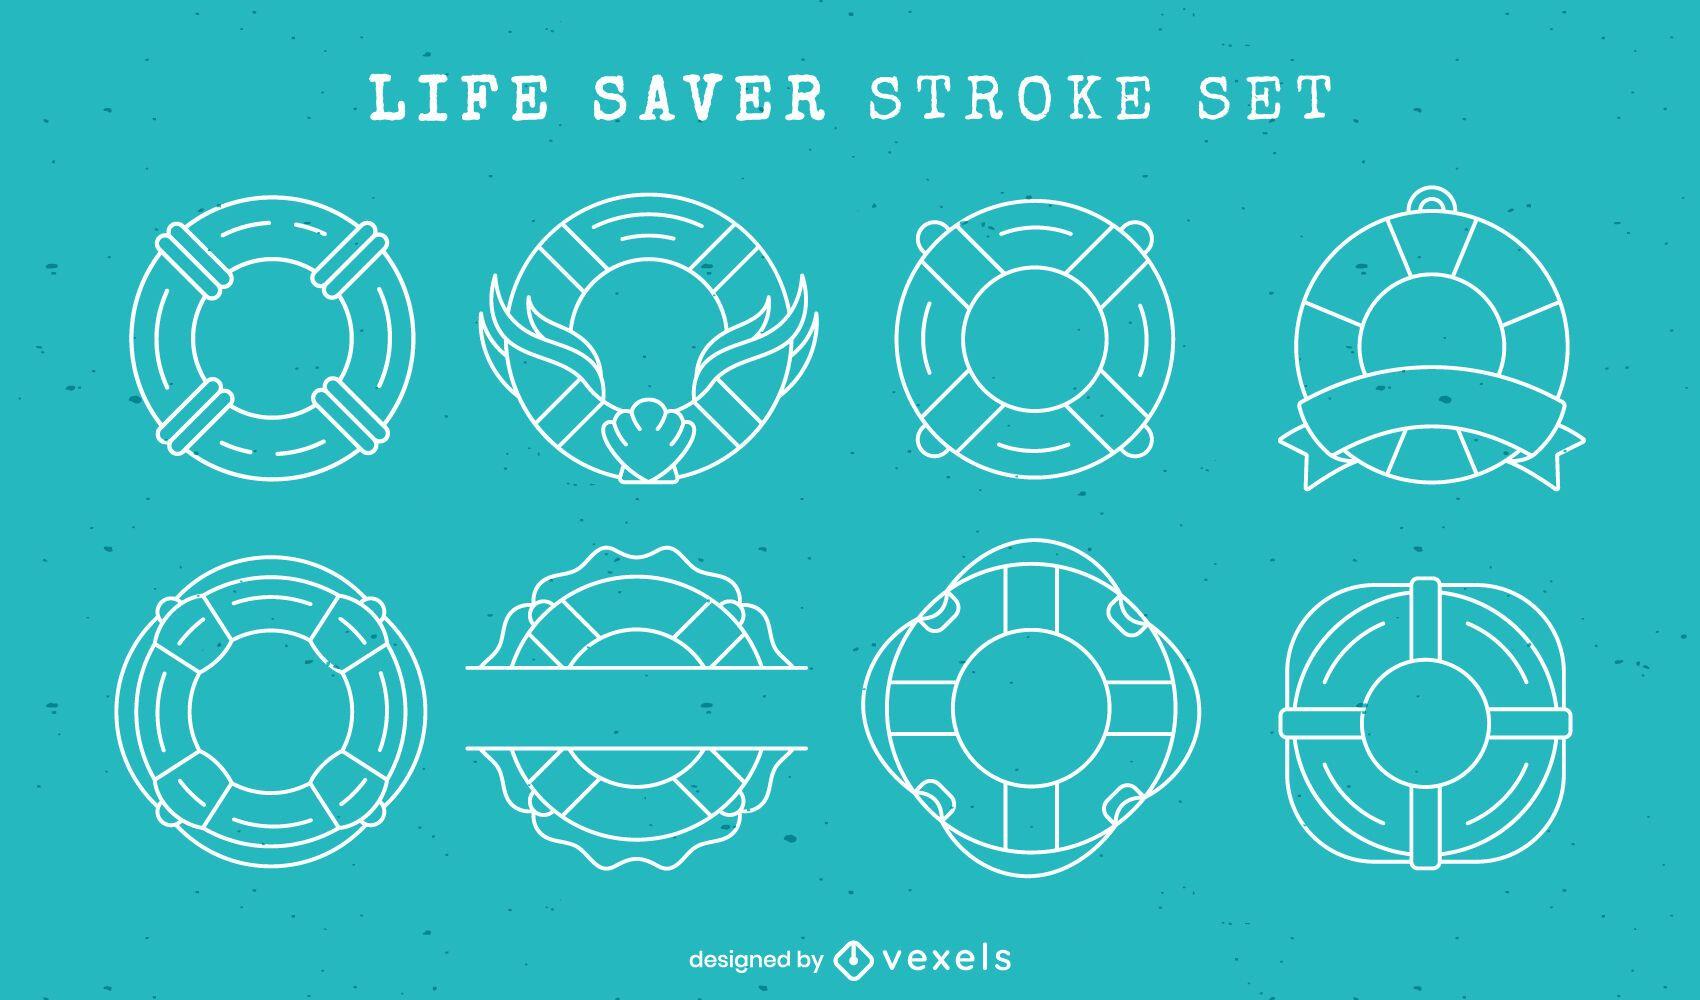 Life saver float rings line art element set